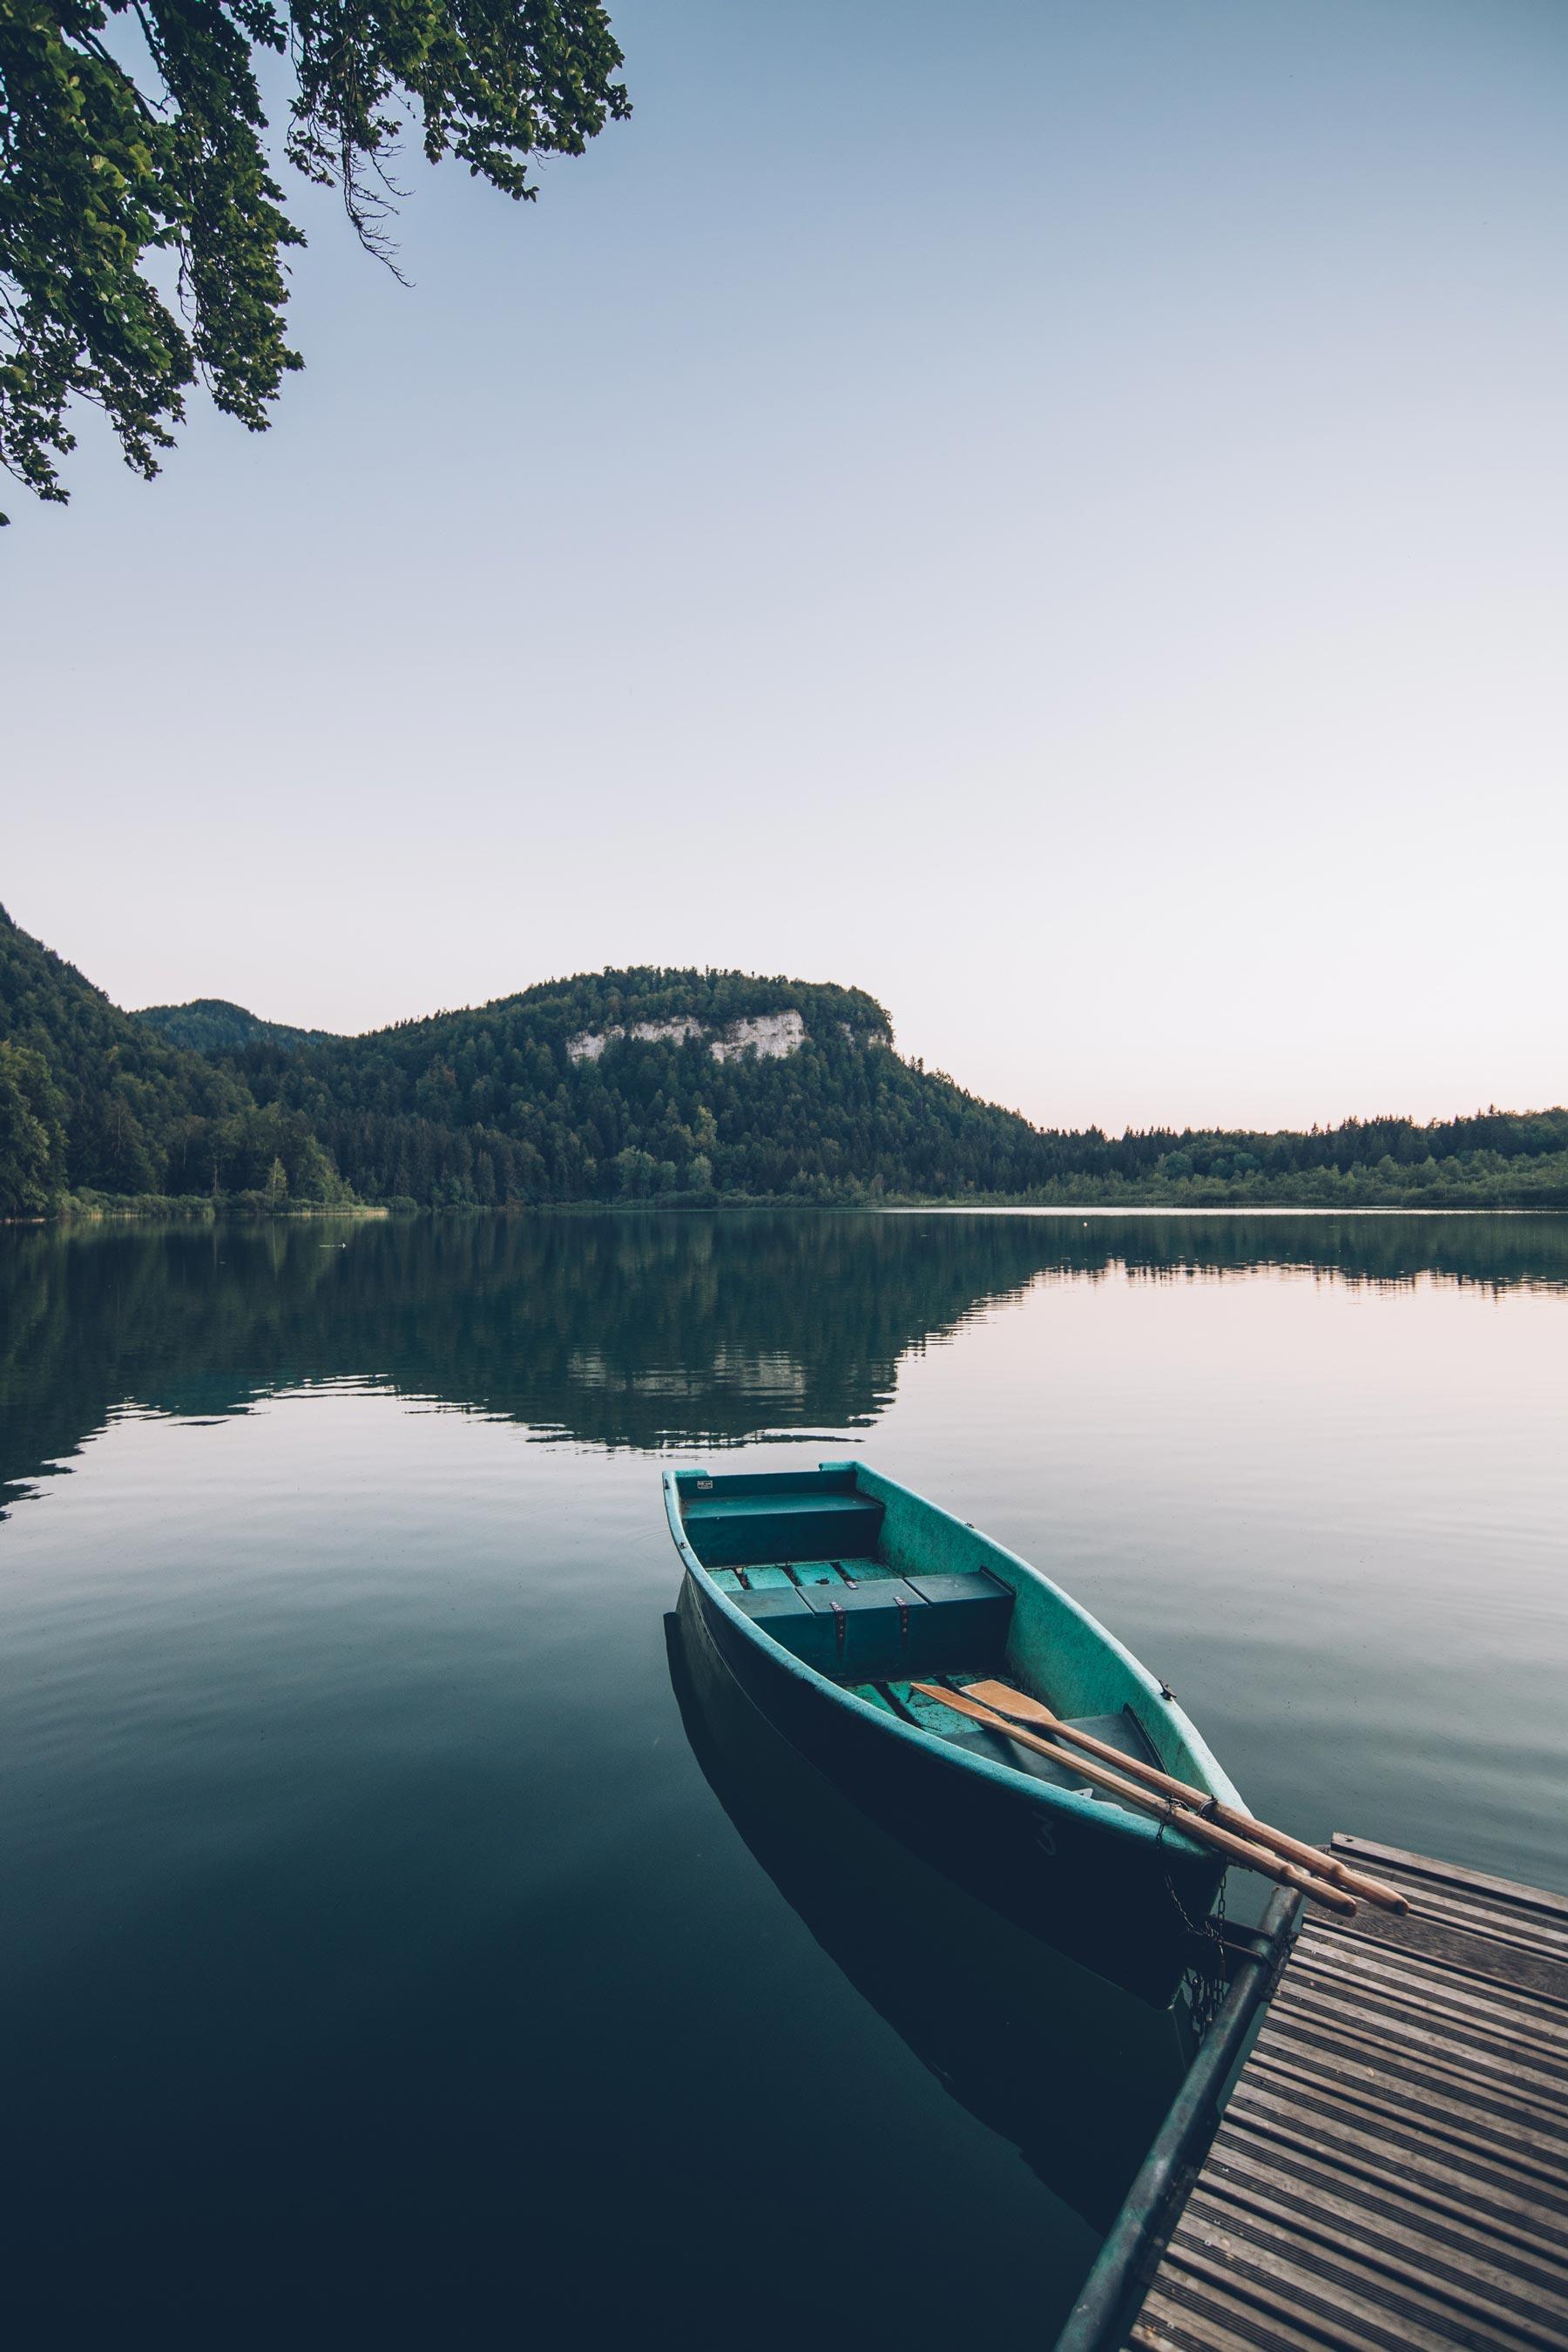 Montagnes du Jura, Lac de Bonlieu